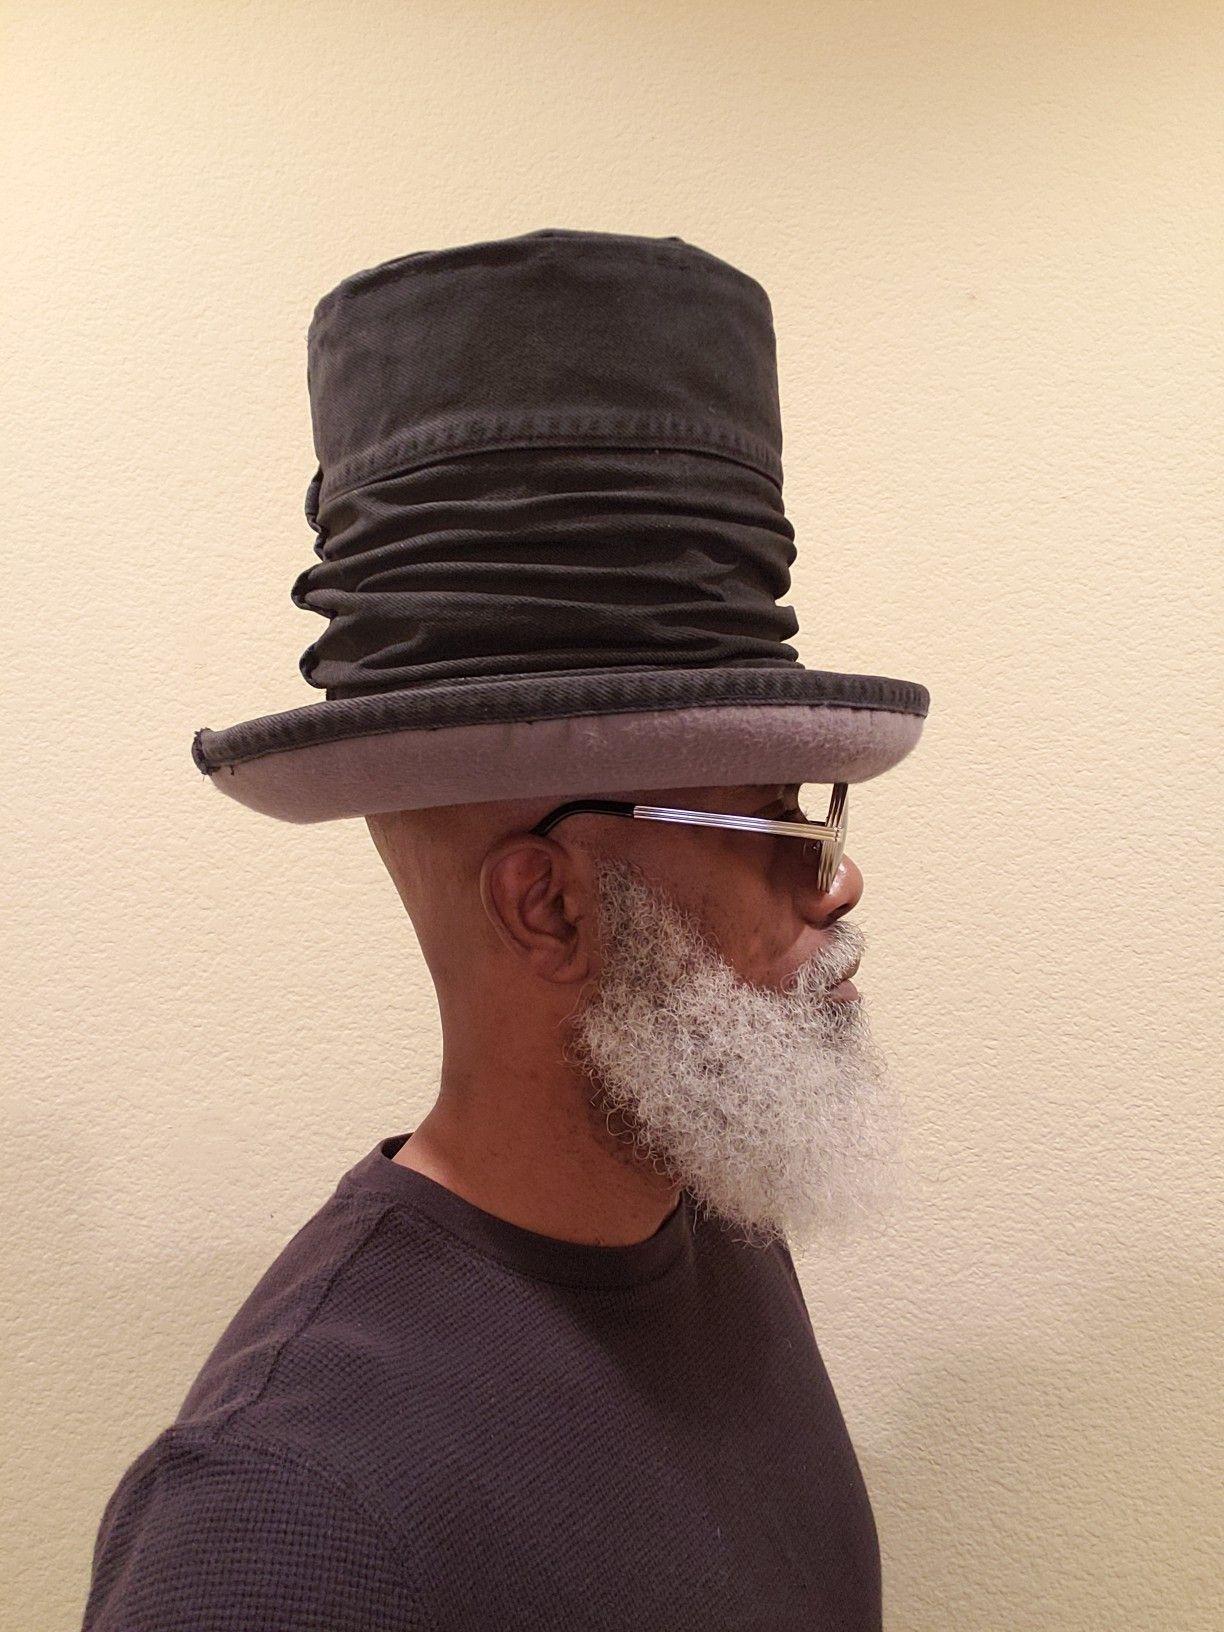 Olds Cool Rasta Style The Black Hatter Rockers Uptown Top Hat Scrunch Polyester Felt Blend Brim With A Black Denim Cr Hat Fashion Men Hats For Men Rasta